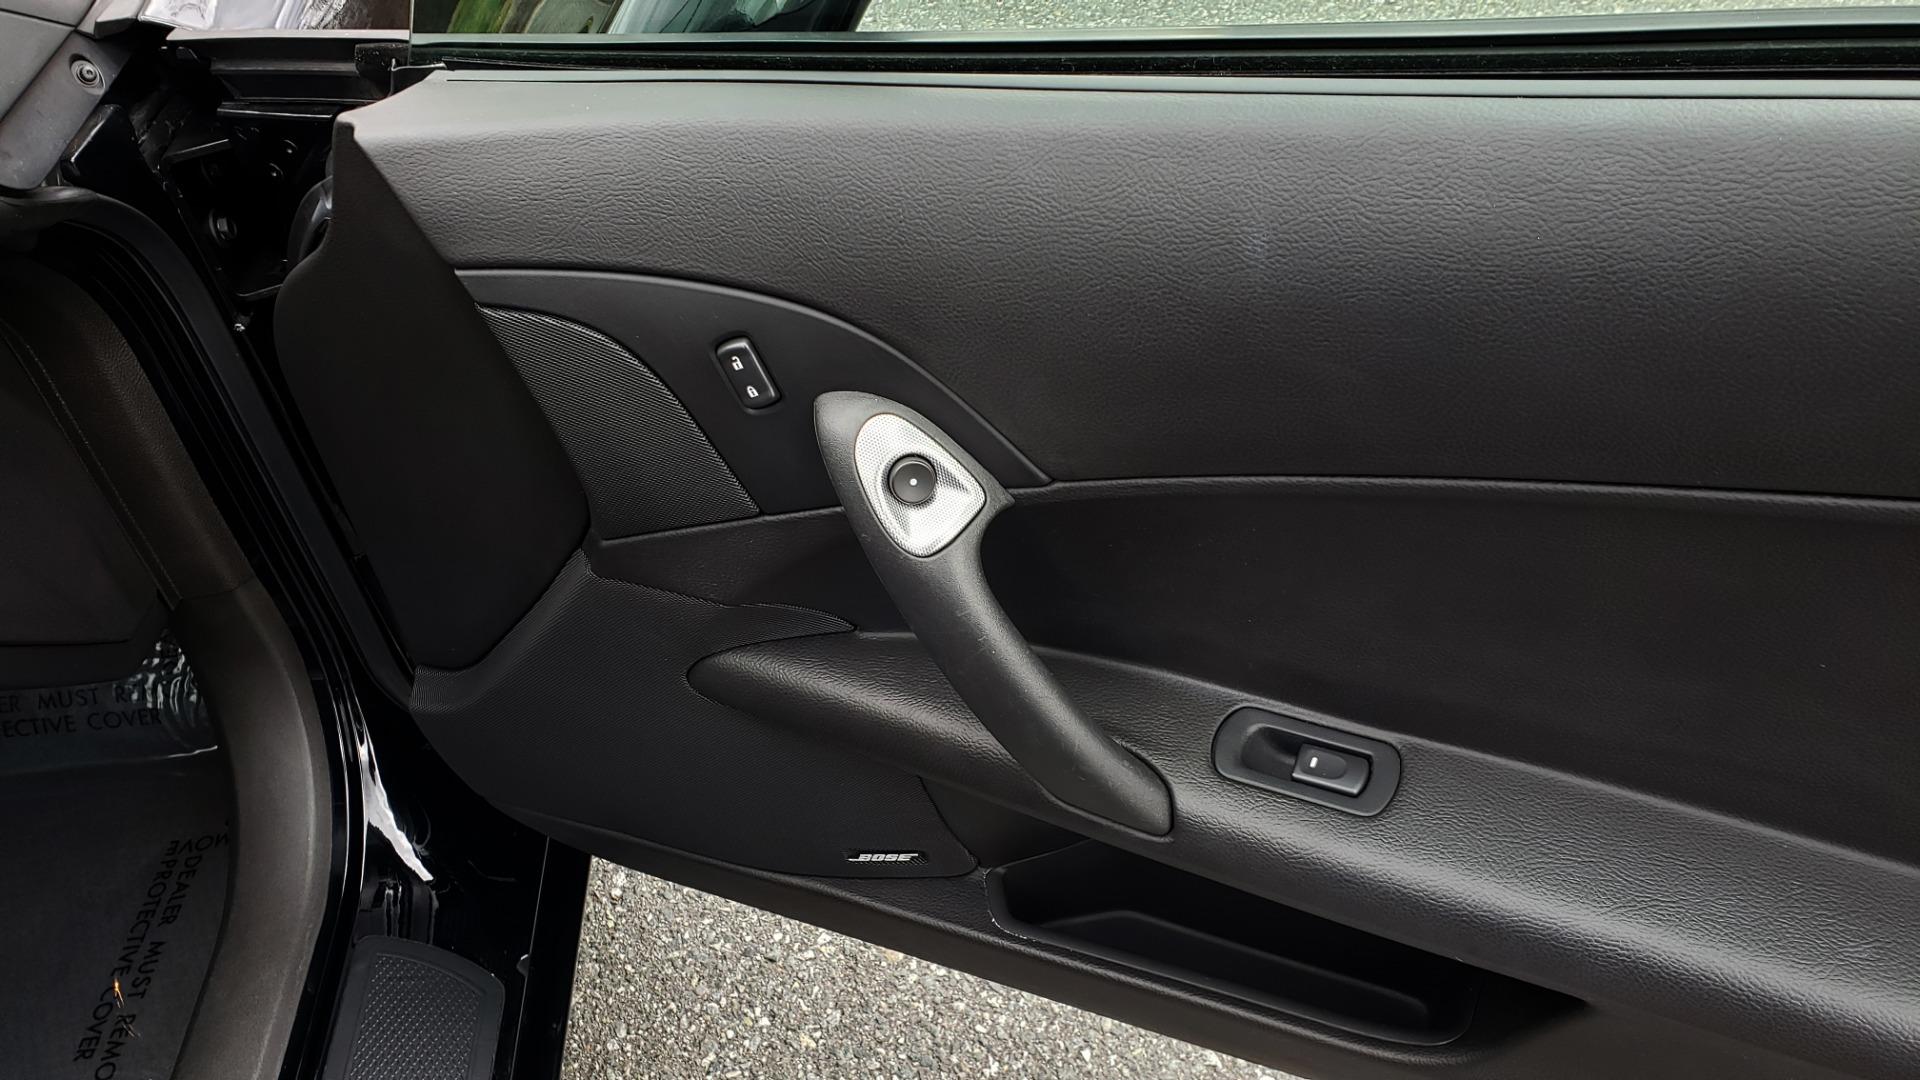 Used 2007 Chevrolet CORVETTE Z06 2LZ / 7.0L 427 V8 / 6-SPD MAN / BOSE / POLISHED WHEELS for sale Sold at Formula Imports in Charlotte NC 28227 81